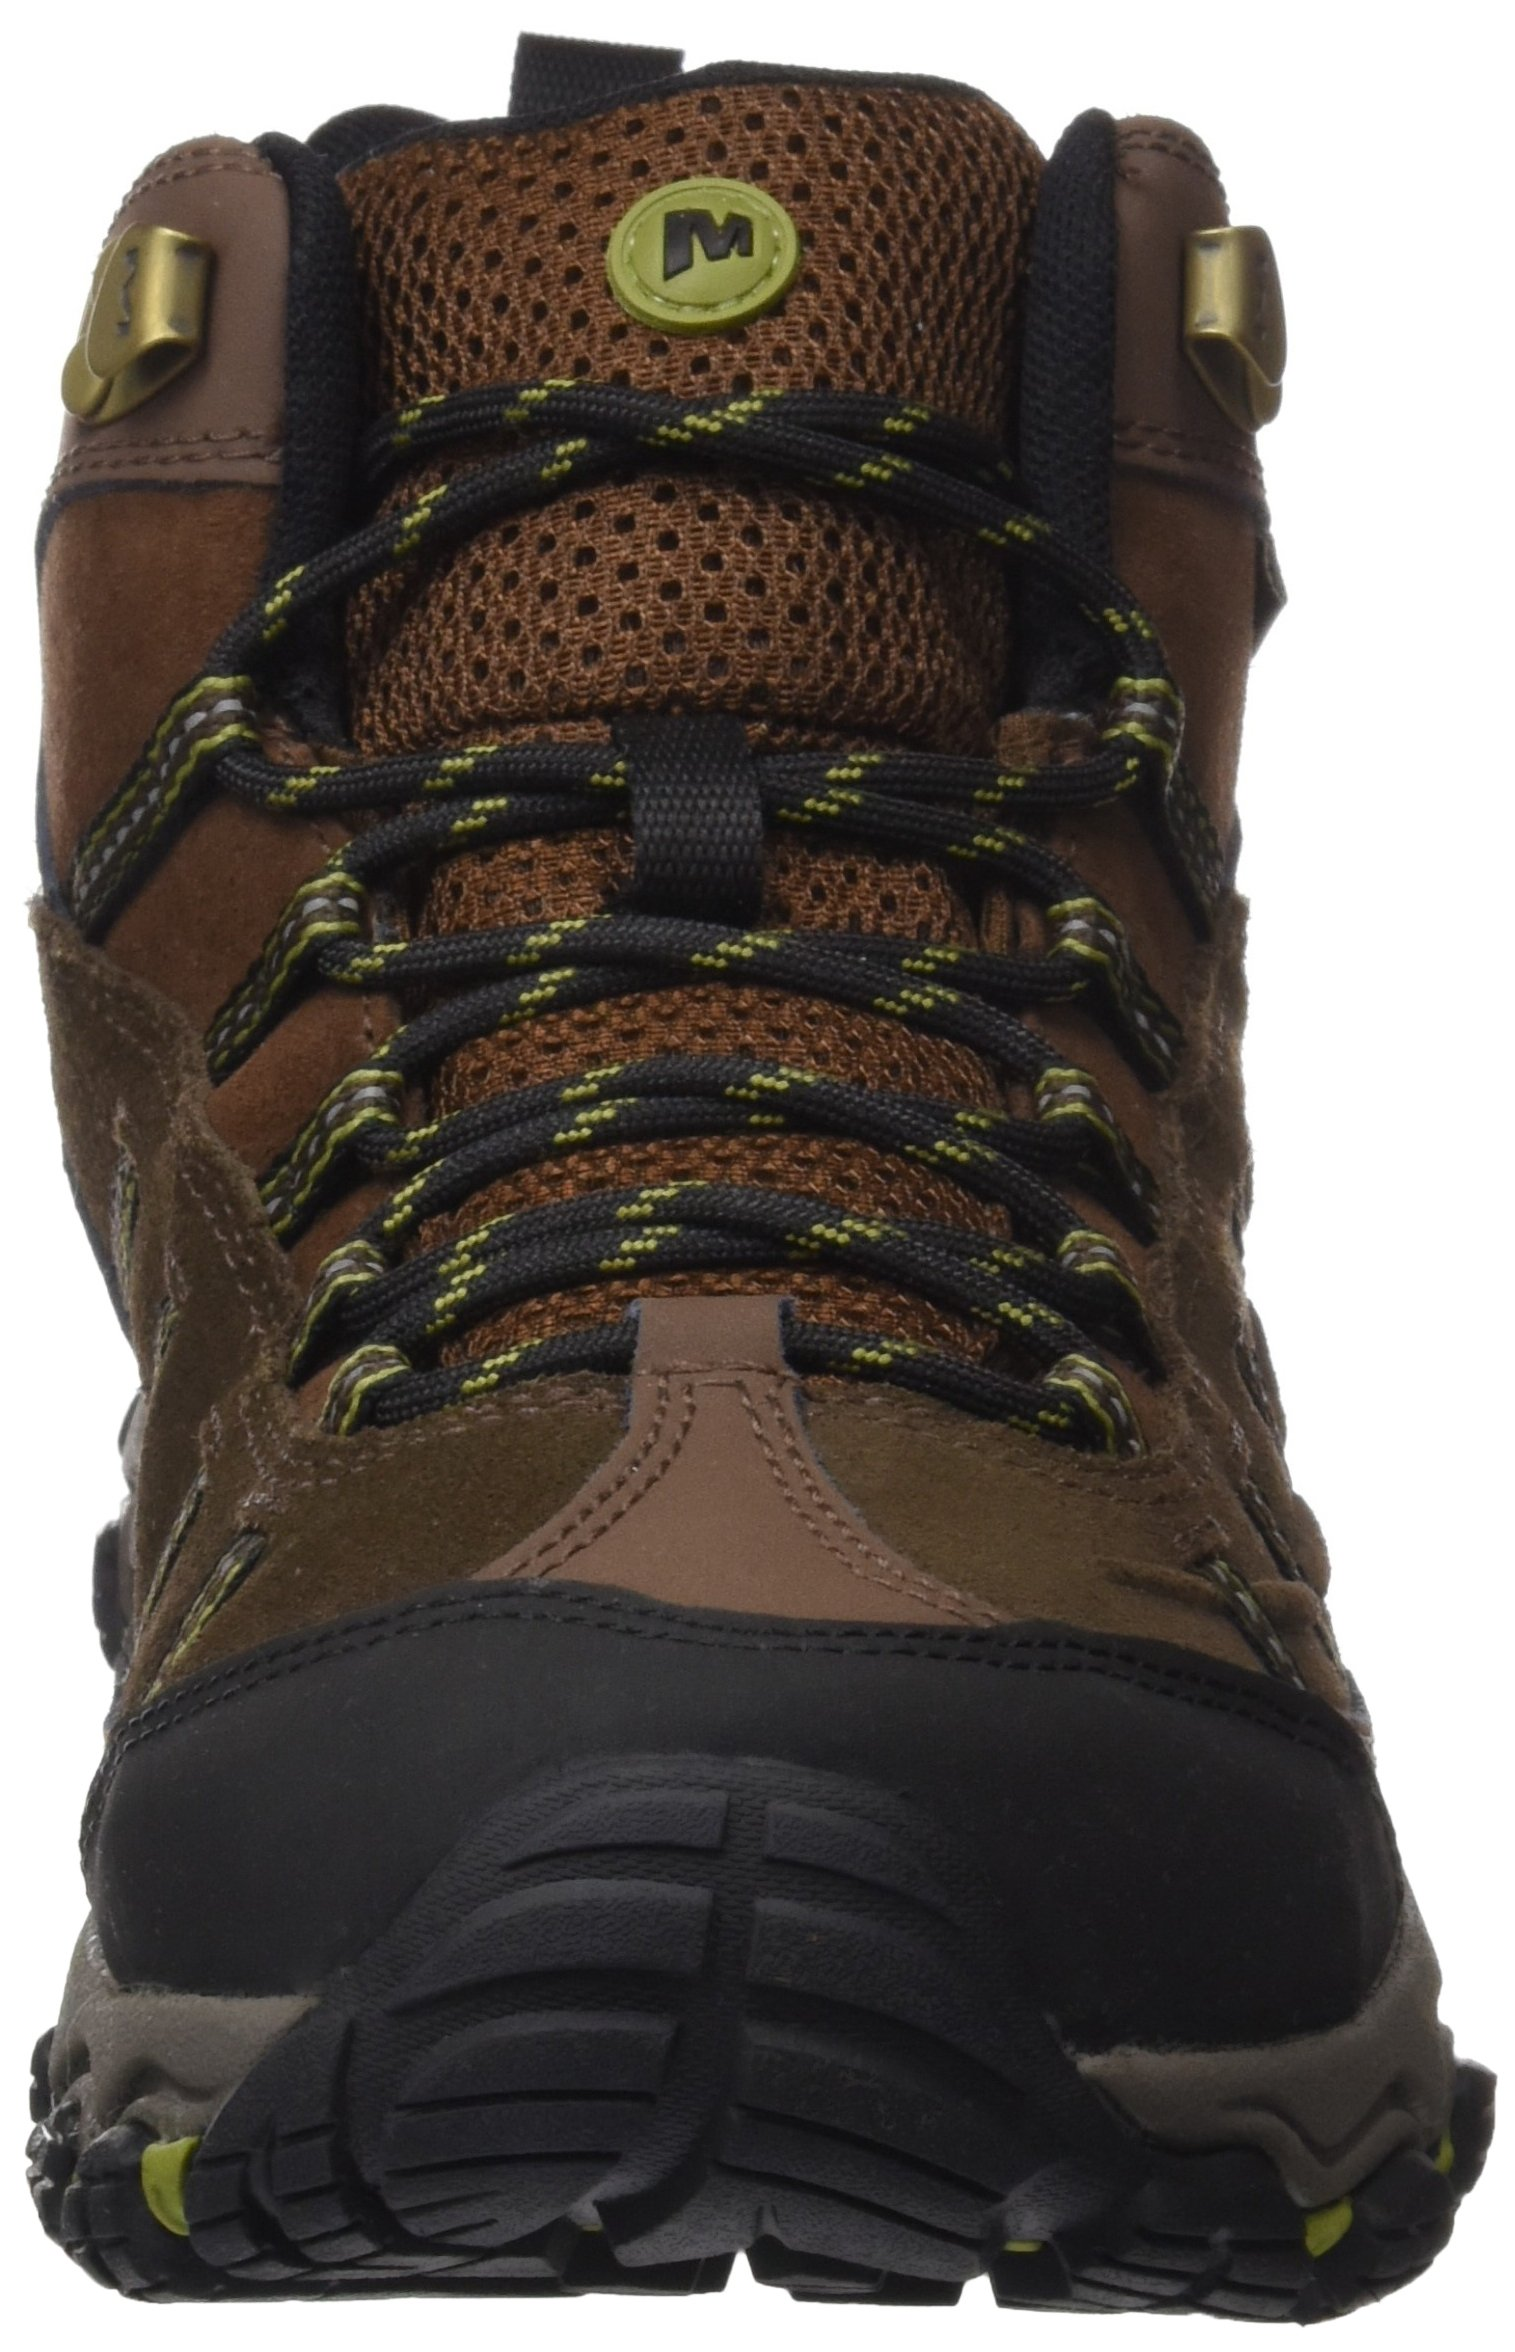 81gwLaTHmuL - Merrell Men's Terramorph Mid Waterproof High Rise Hiking Boots